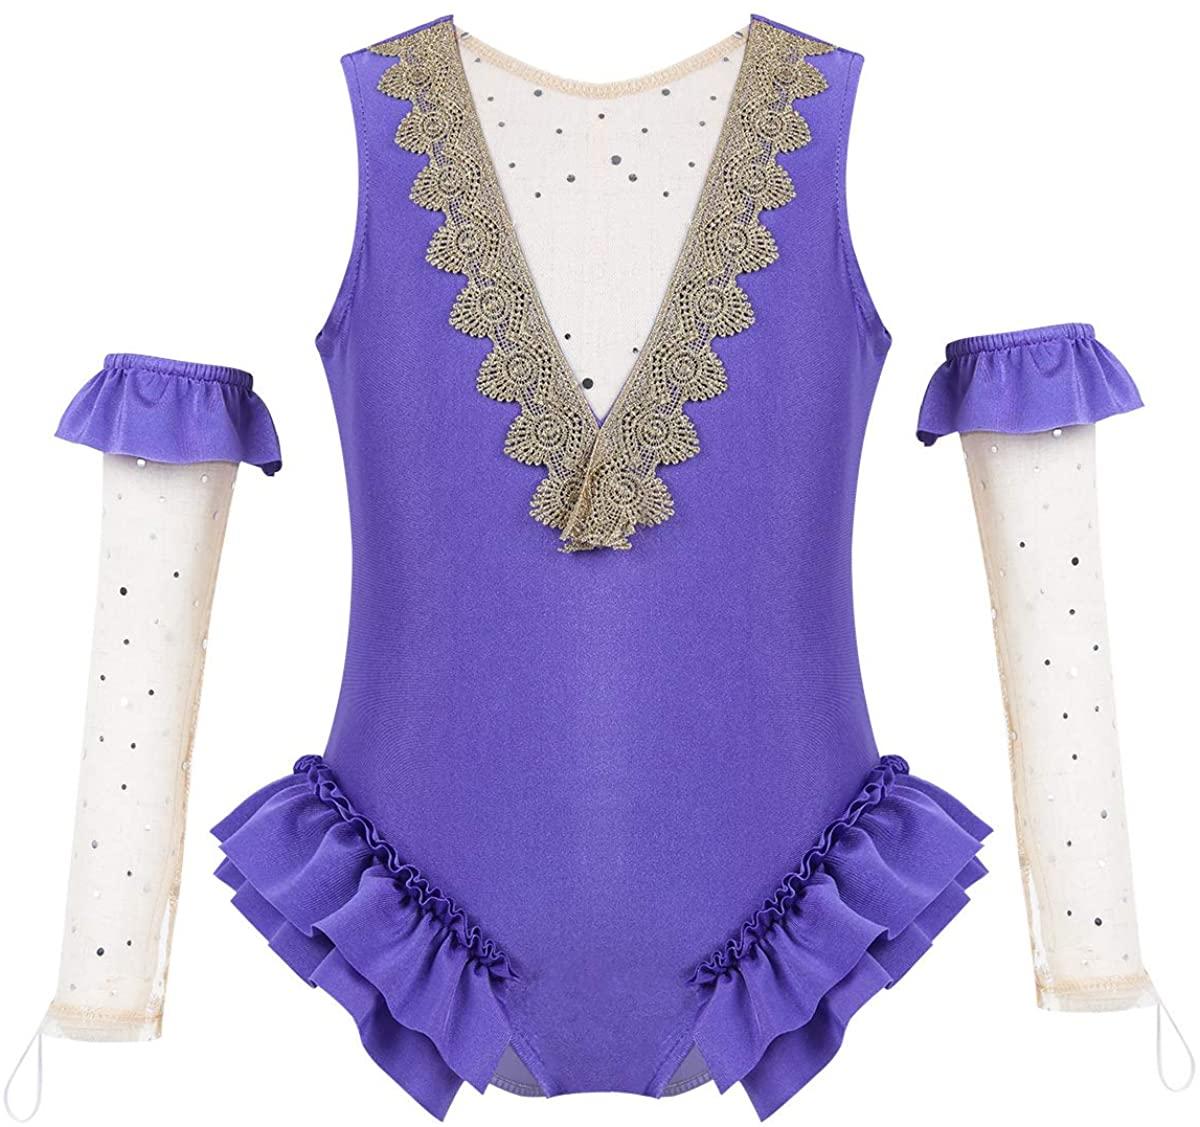 Hularka Kids Girls Dance Show Costume Princess Halloween Cosplay Outfits V-Shape Back Ruffle Leotard with Arm Sleeves